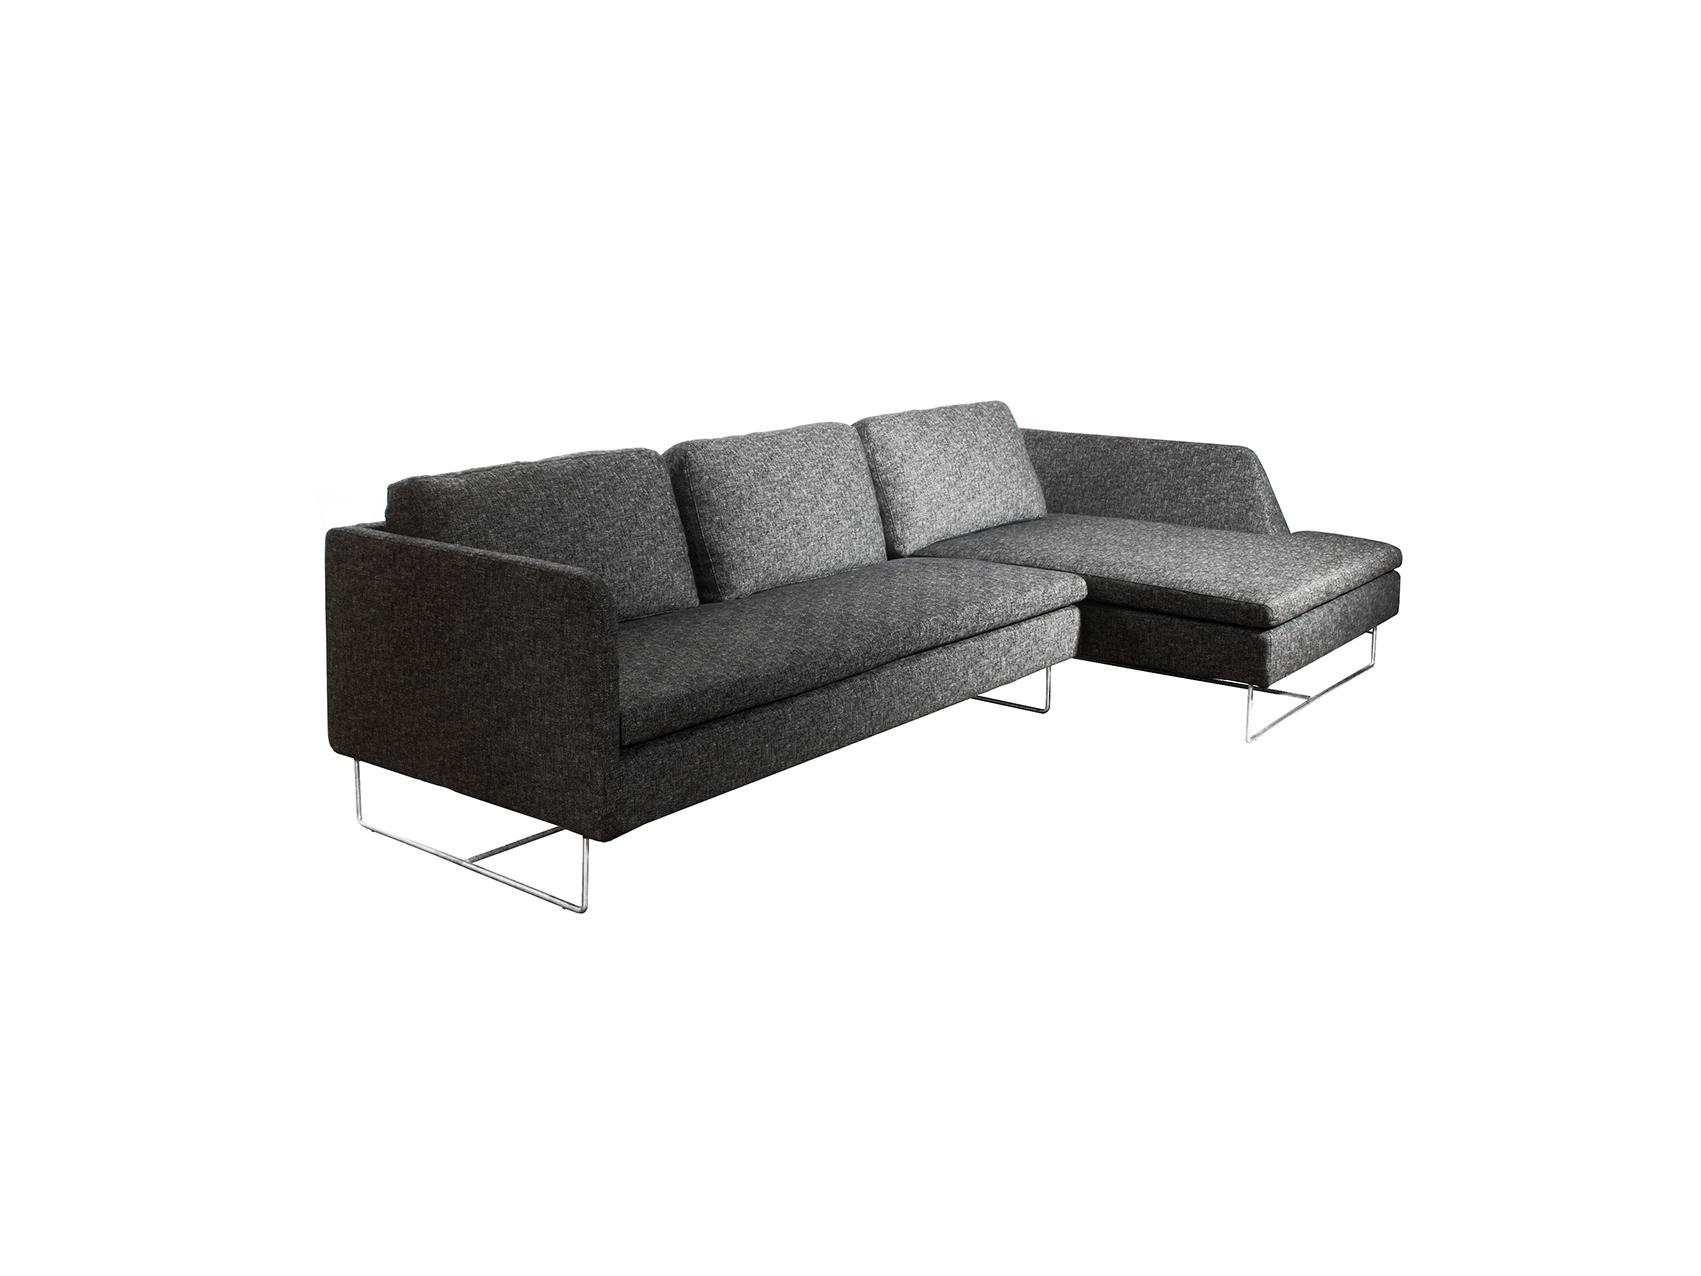 Sketch sofa designers guild rgs rock galpin studio for Sofa design sketch